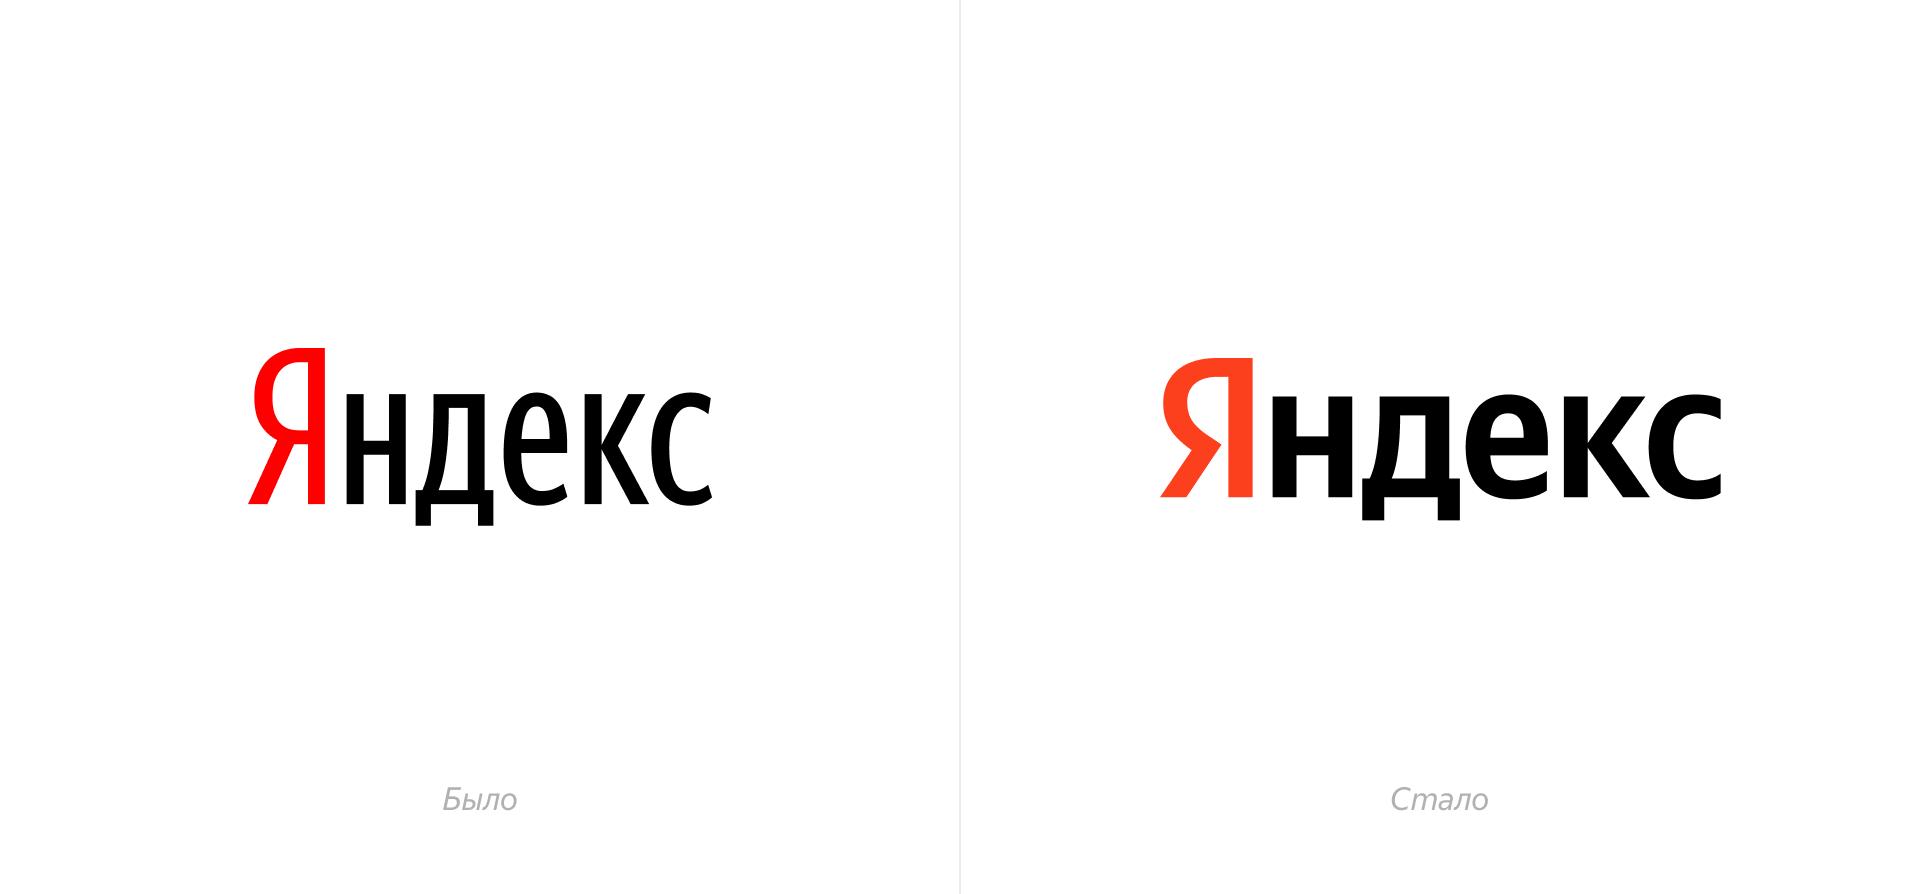 смена логотипа Яндекс